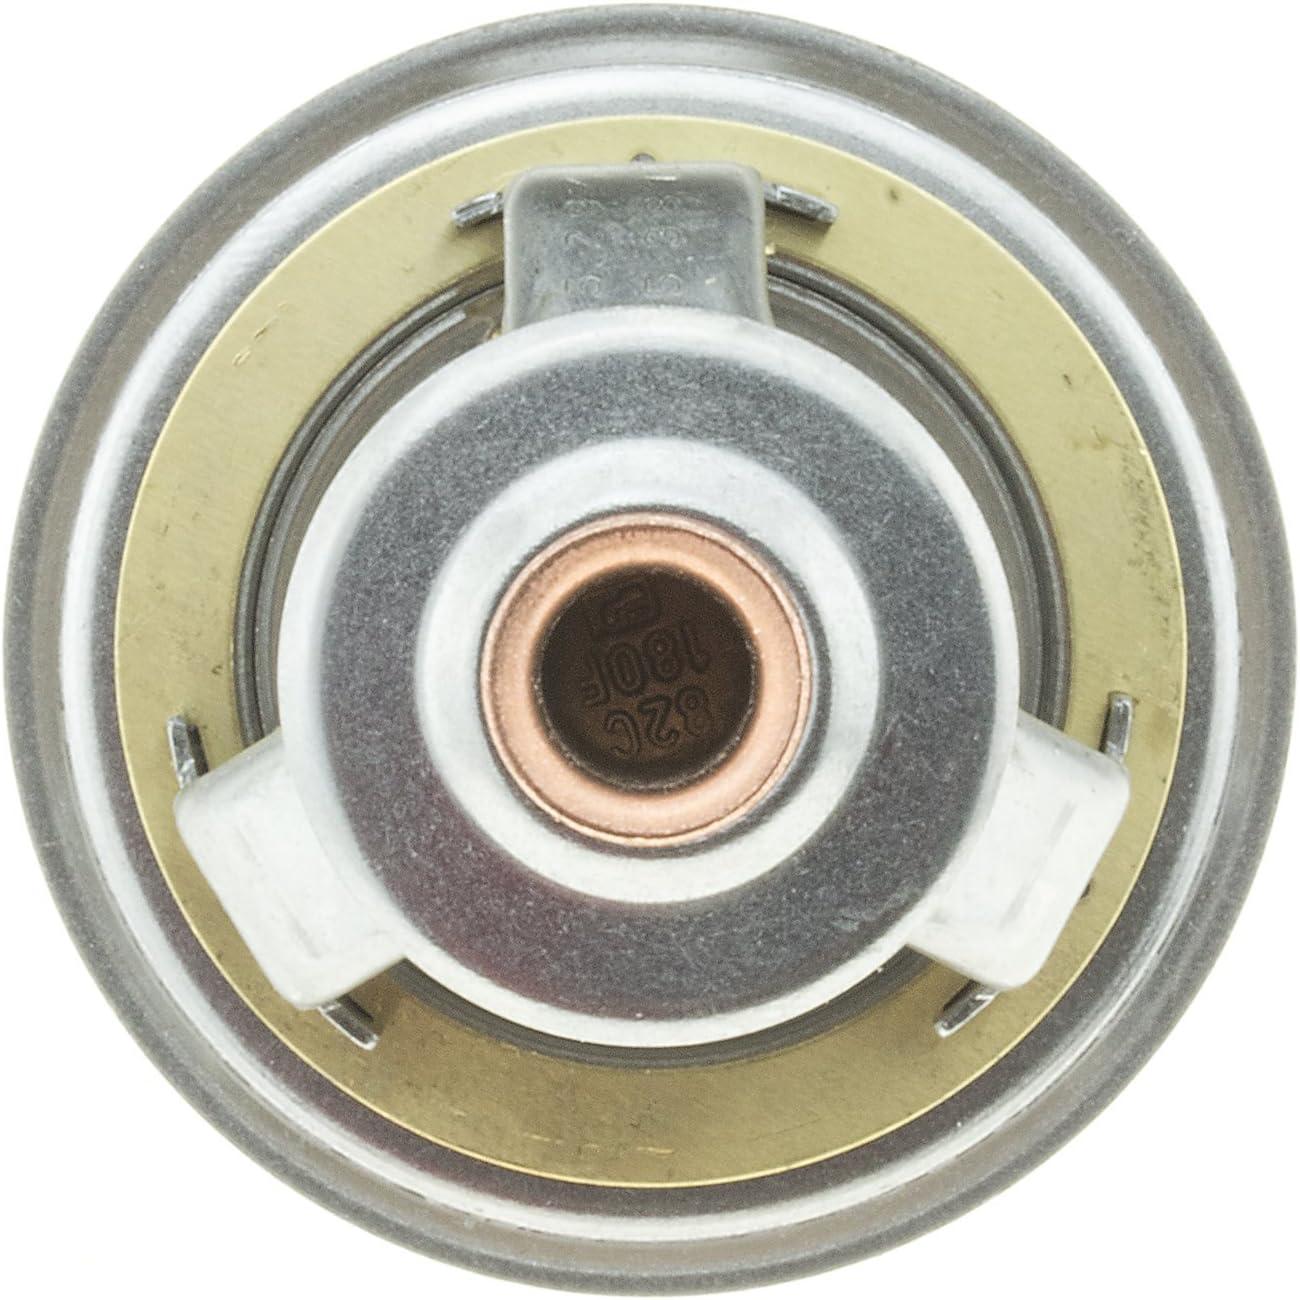 Motorad 7281-180 Failsafe Thermostat